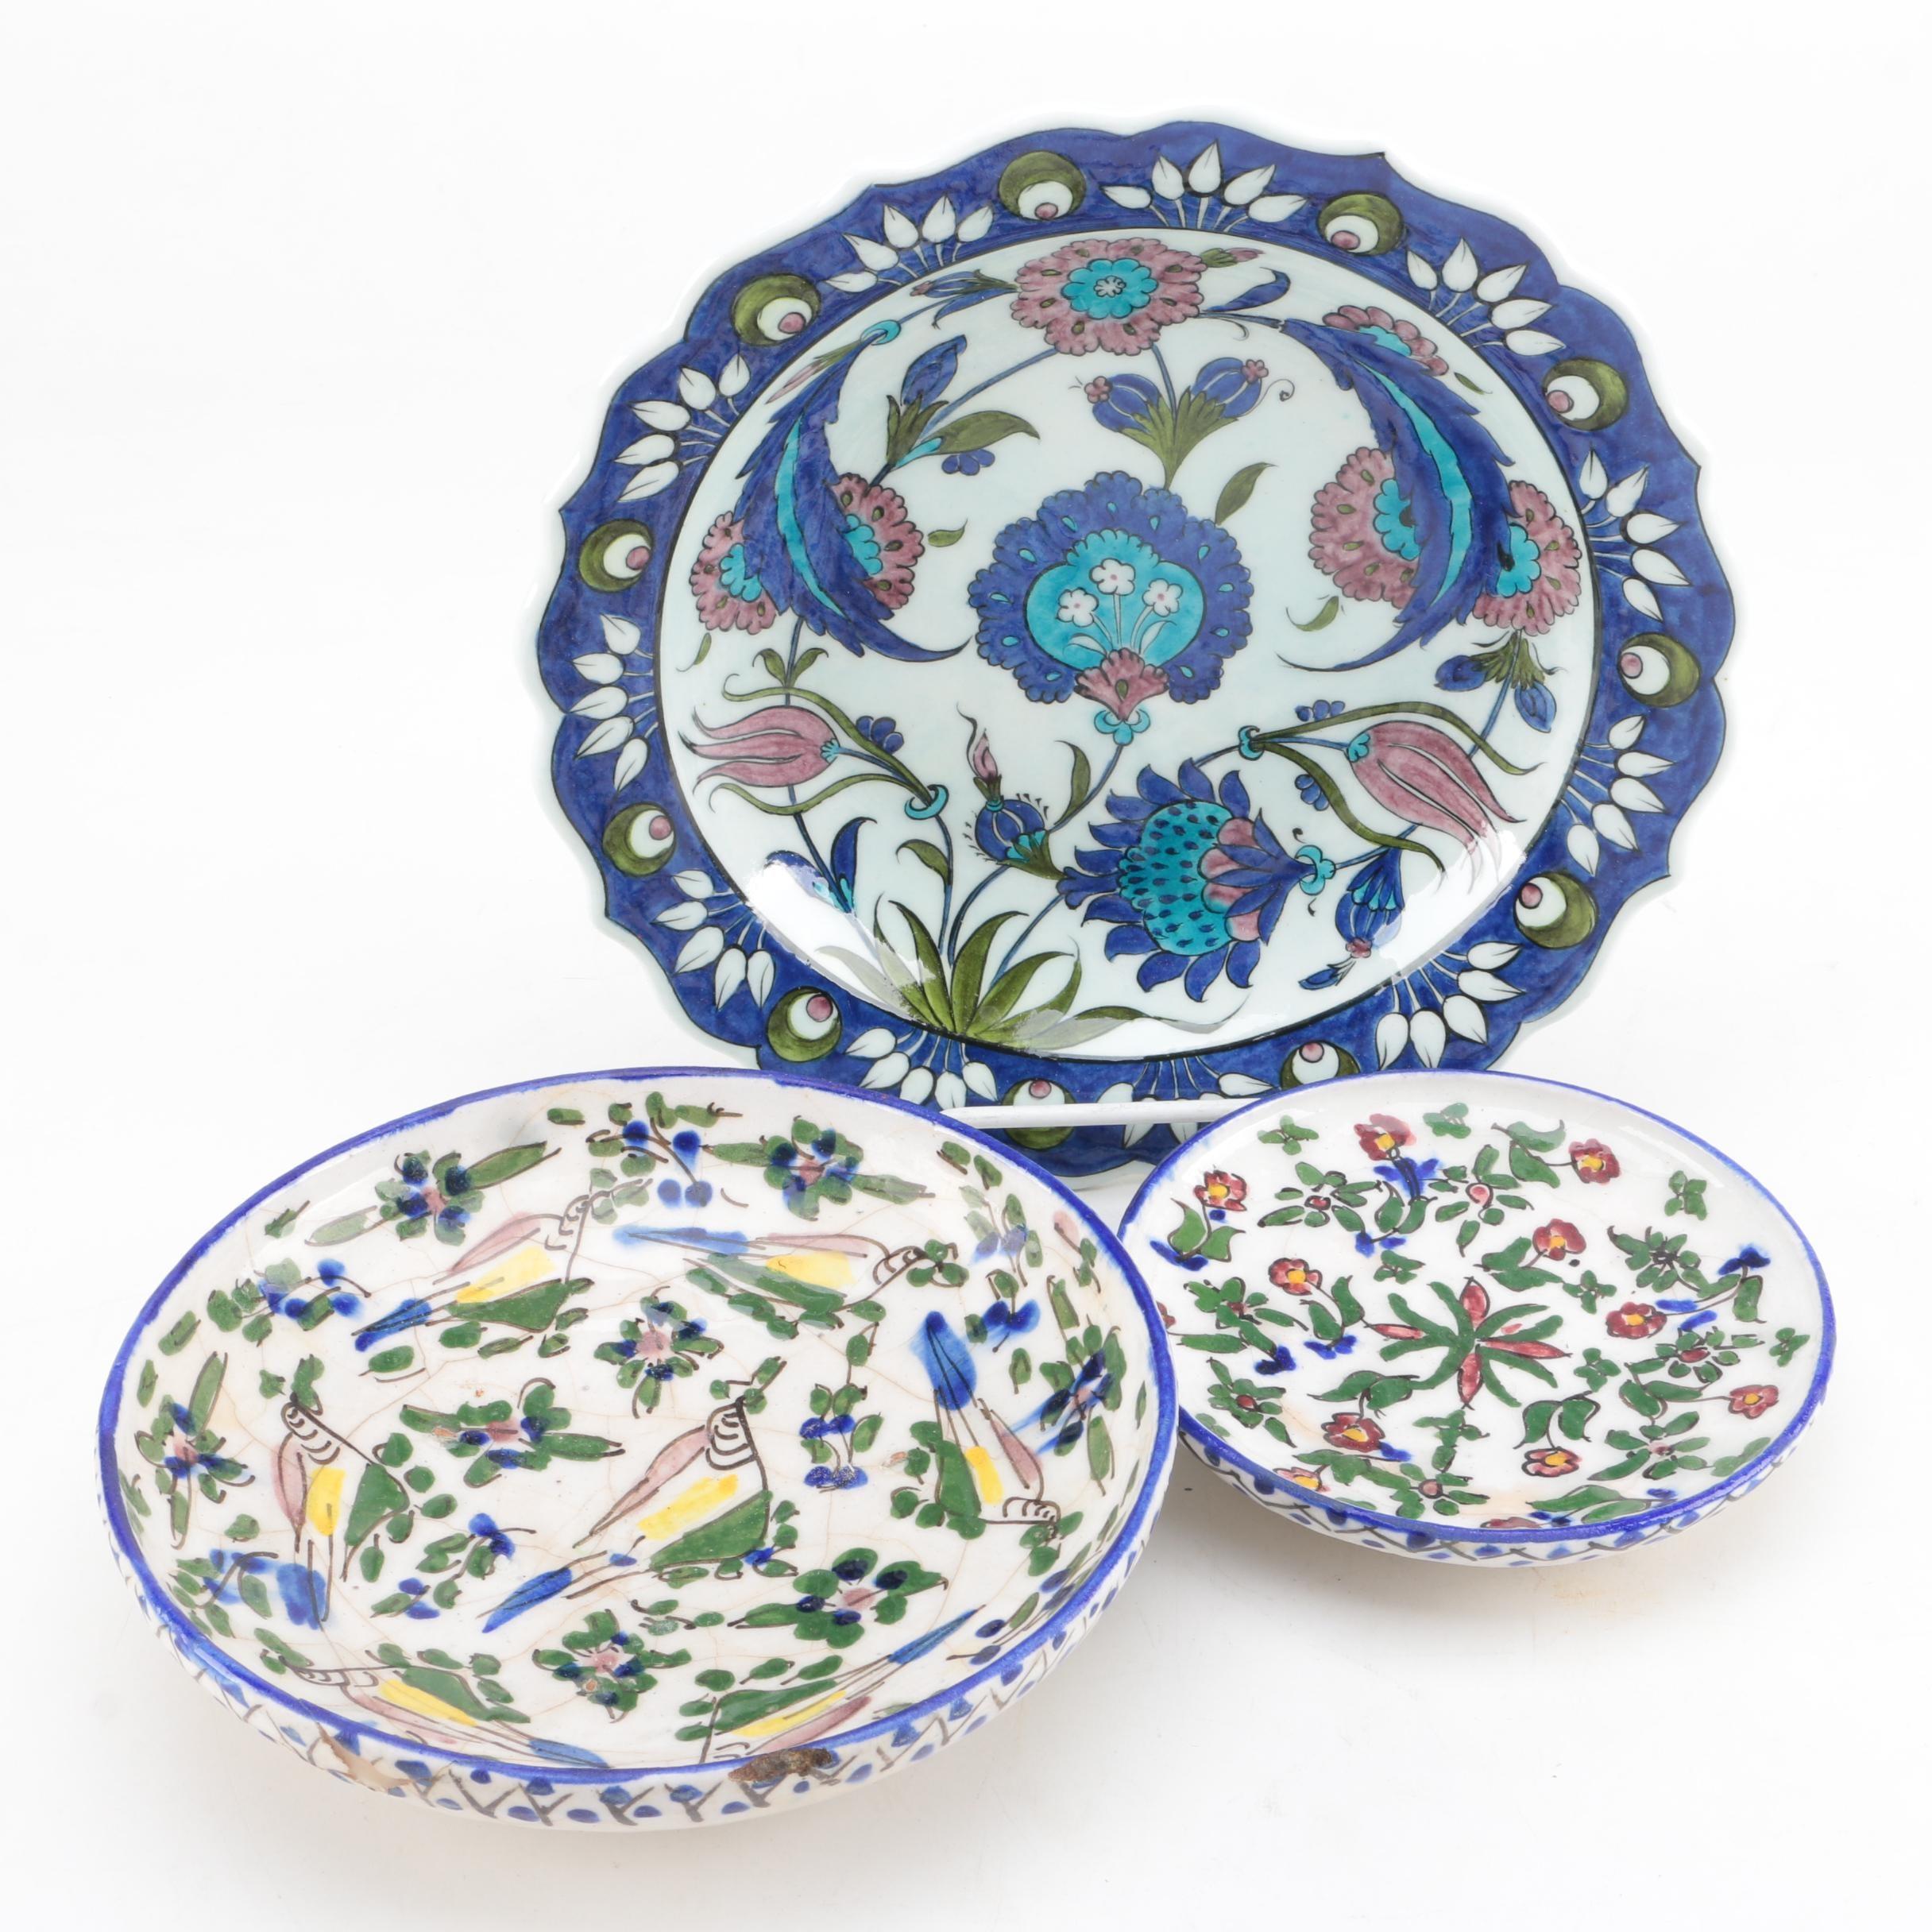 Pottery Tableware Featuring Signed Ibrahim Kuslu Turkish Pottery Plate ...  sc 1 st  EBTH.com & Pottery Tableware Featuring Signed Ibrahim Kuslu Turkish Pottery ...